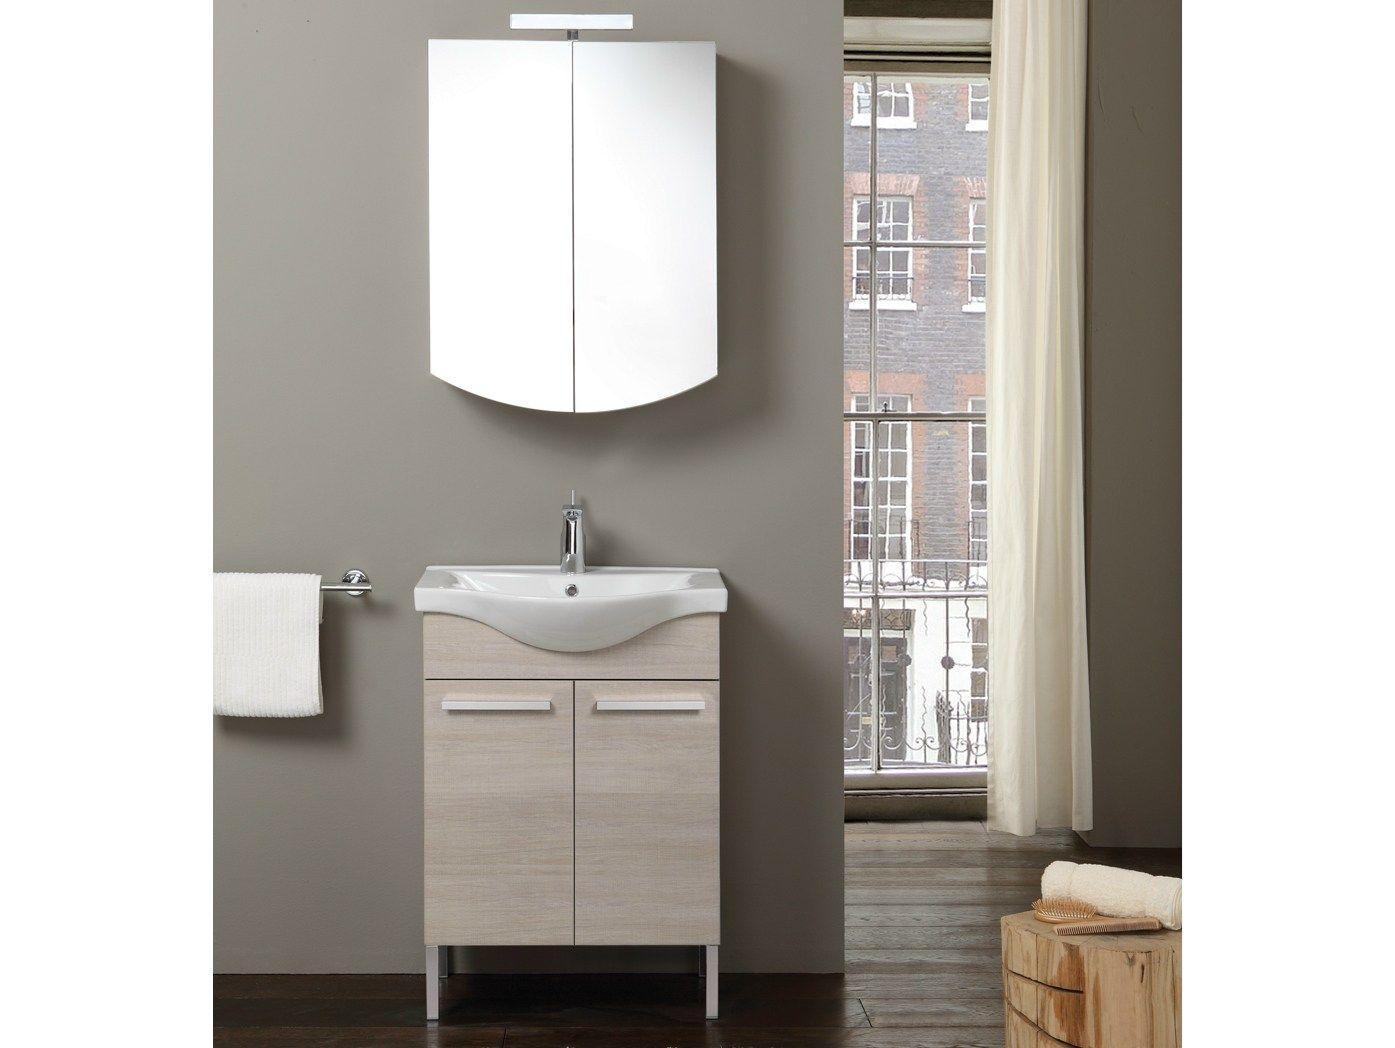 Meuble sous vasque en bois avec miroir tribeca 7 for Miroir urban